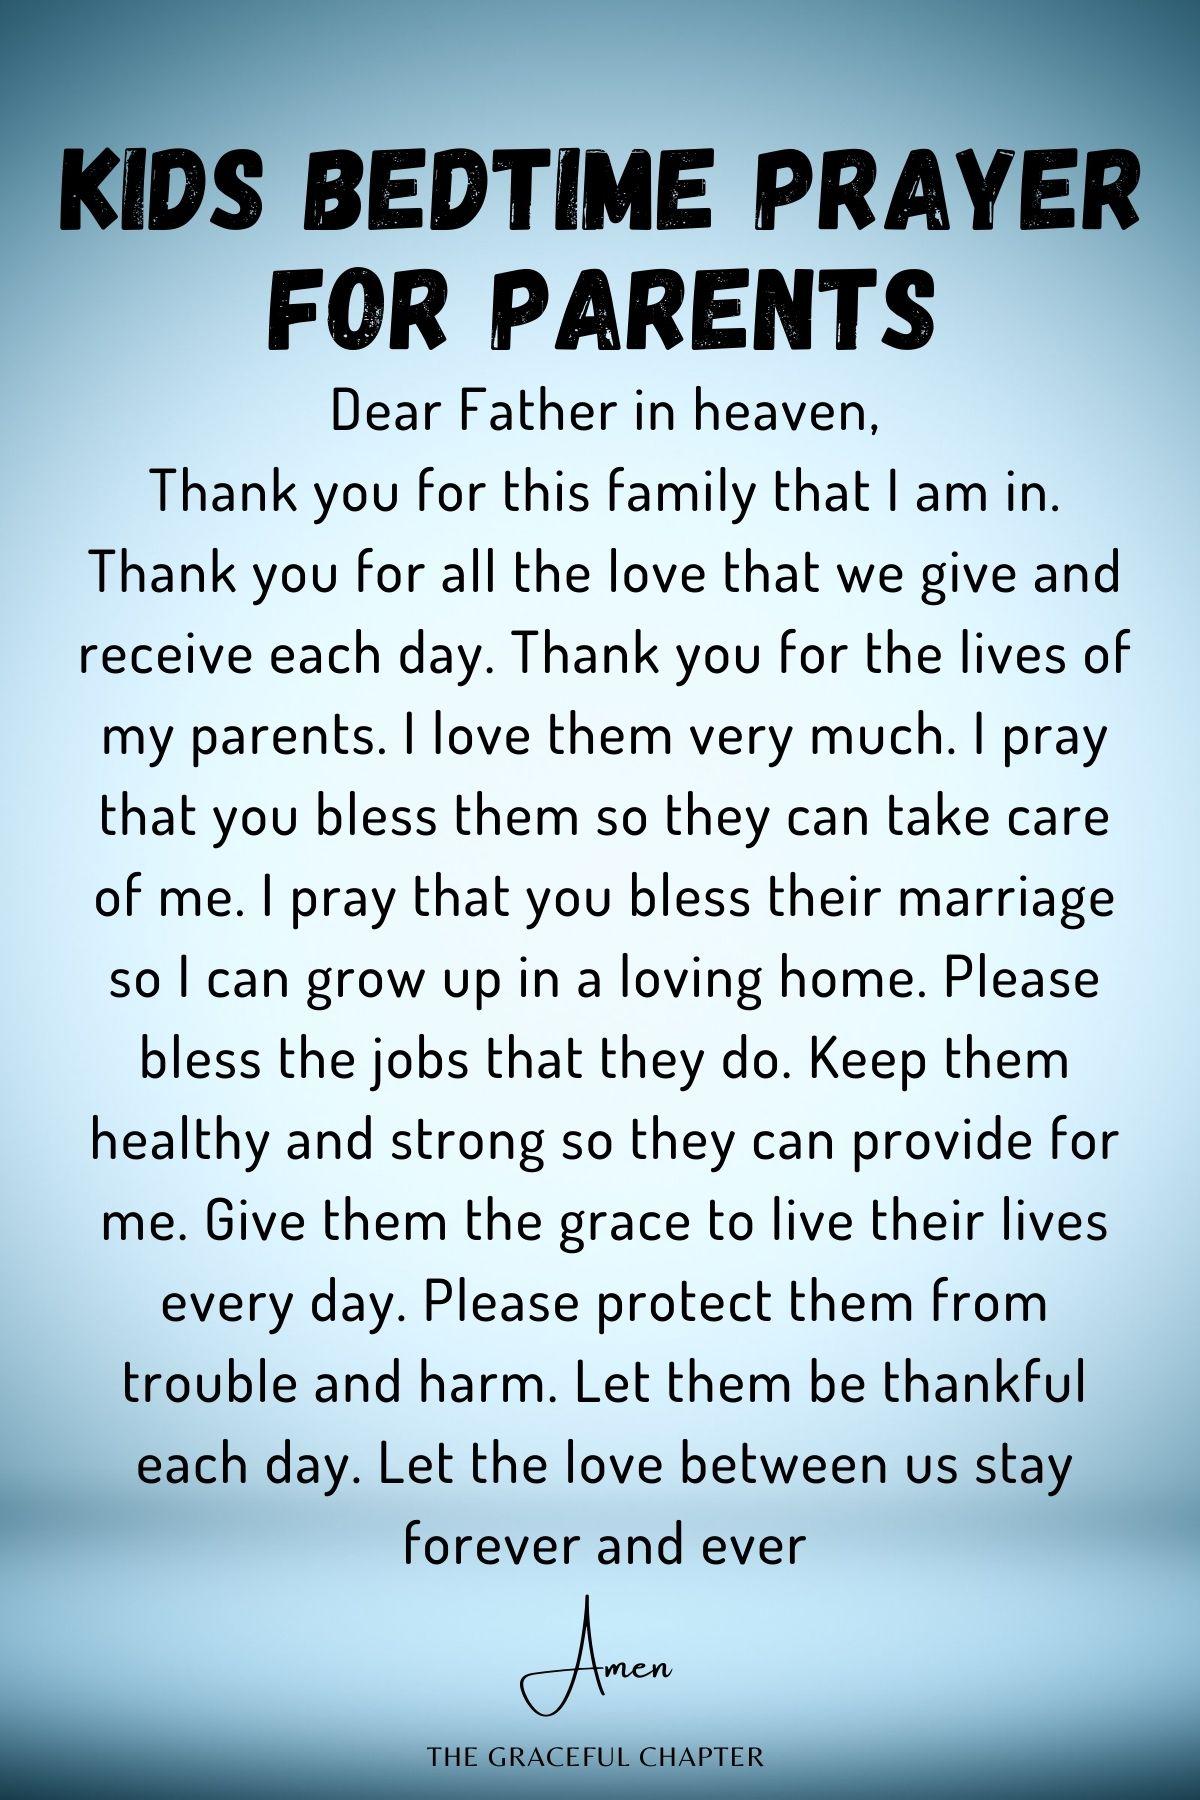 Kids bedtime prayer for parents